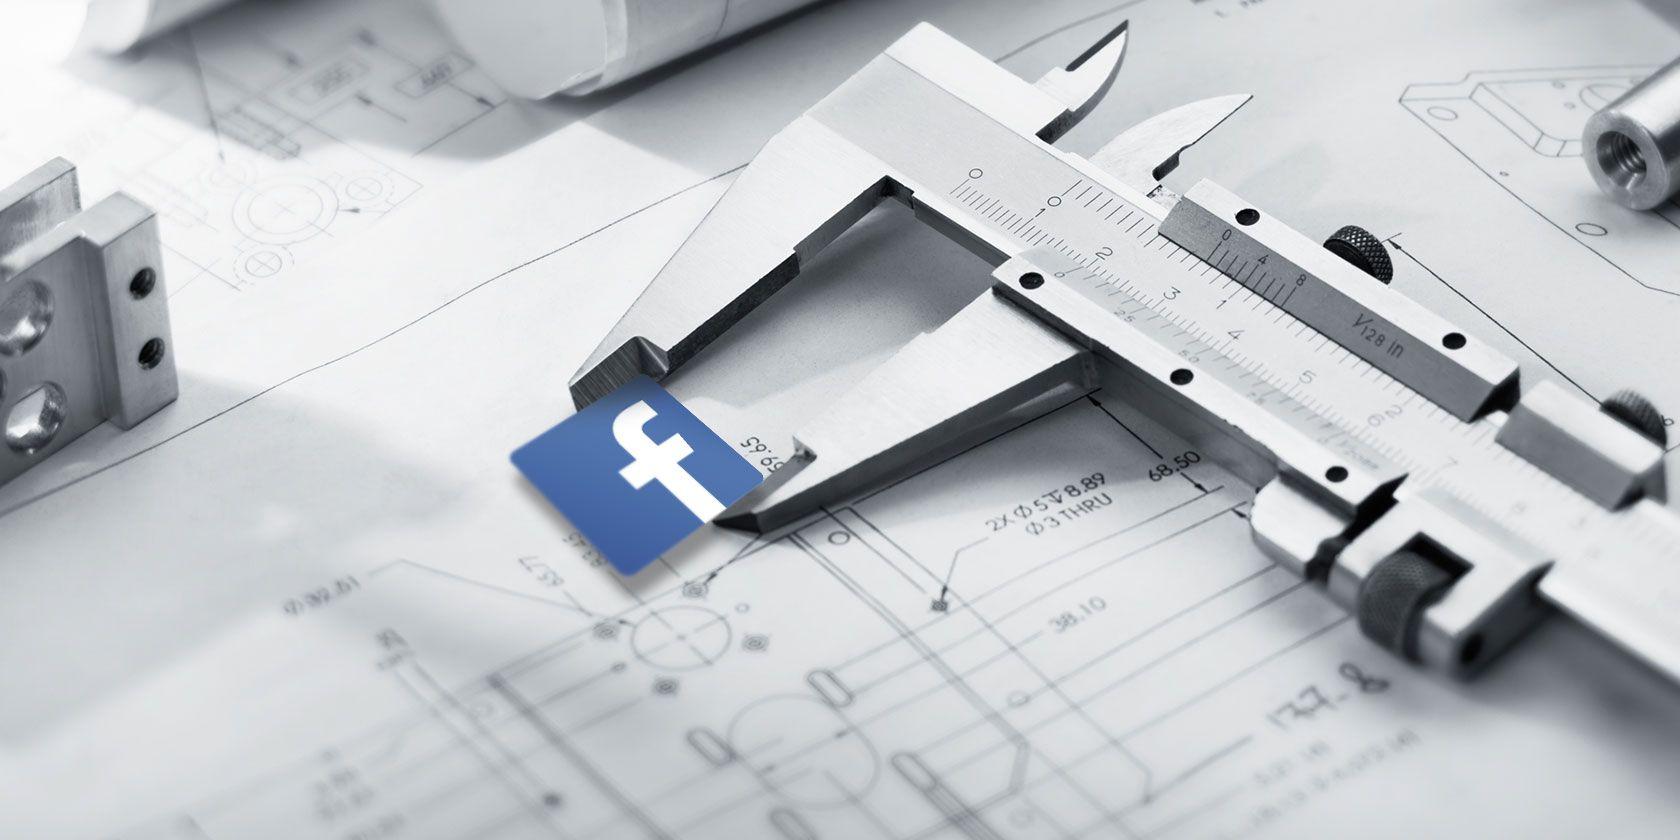 facebook-image-sizes-2018